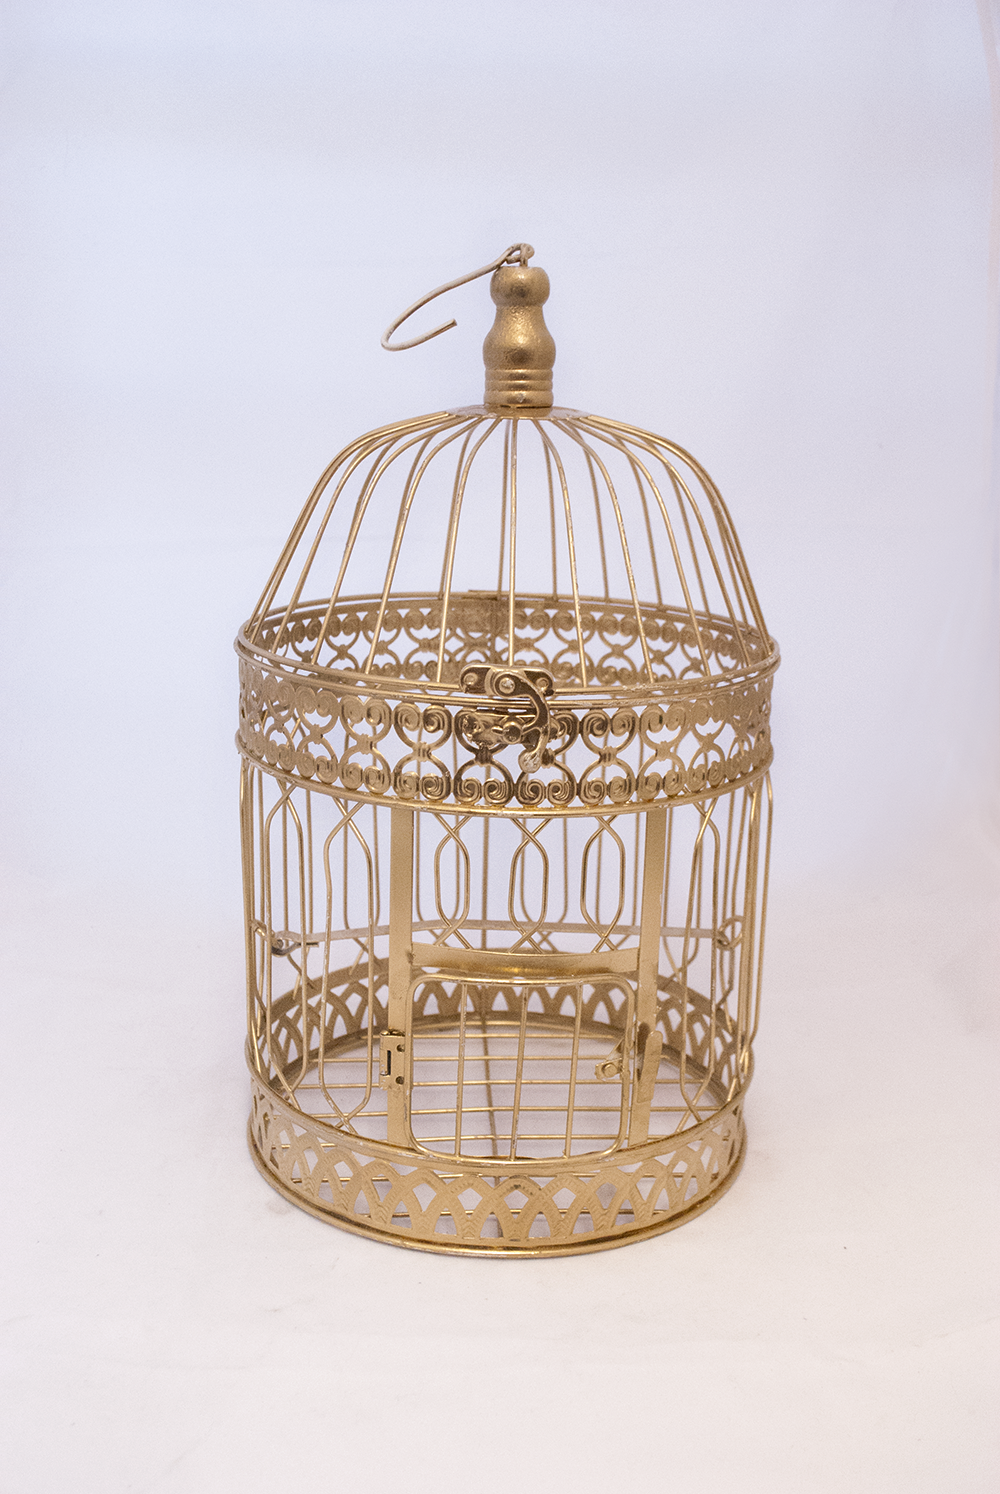 gold birdcage (large)   Quantity: 2  Price: $17.00